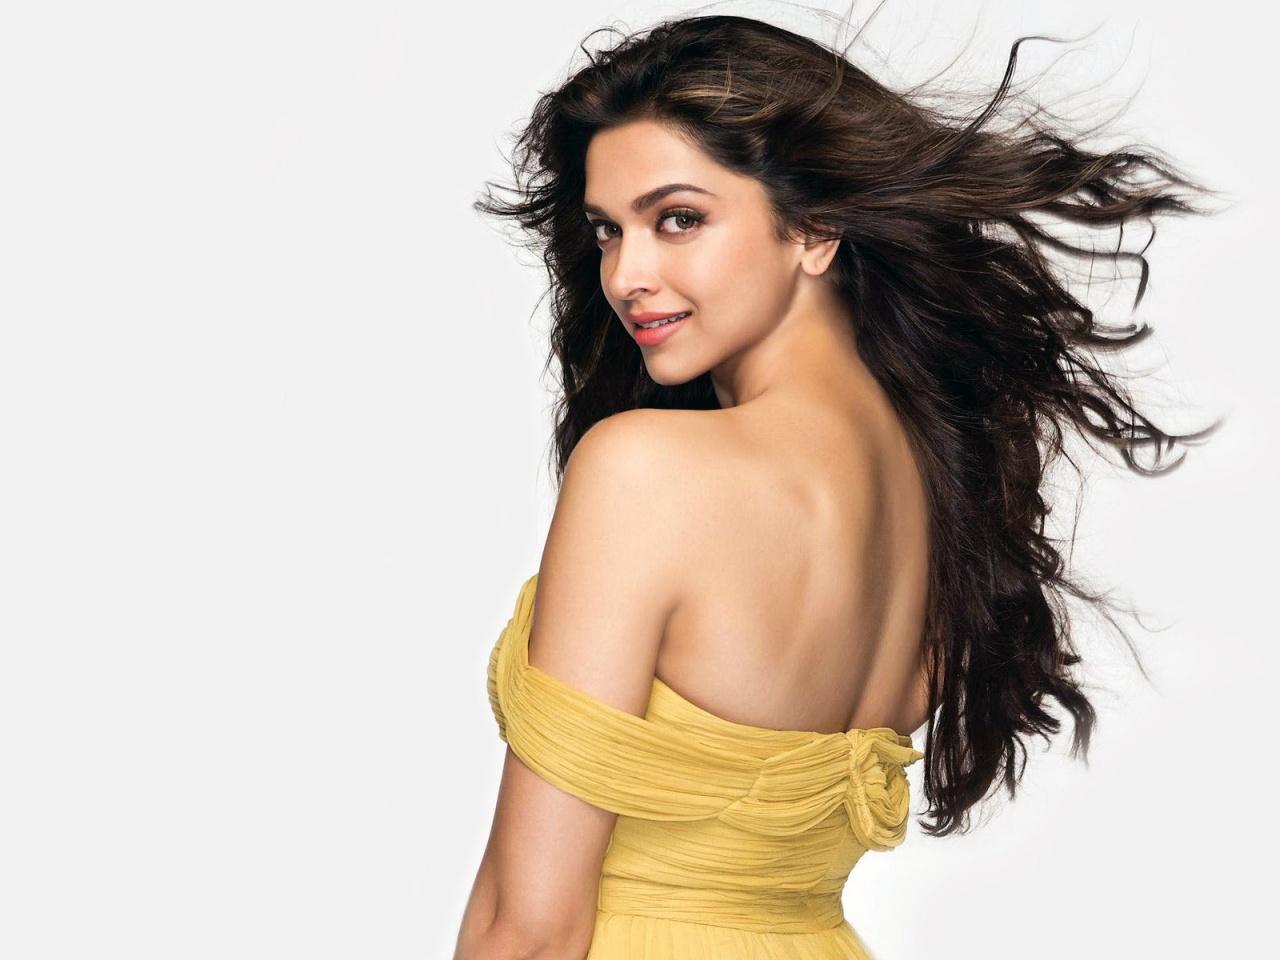 HD Wallpapers Bollywood Actress Deepika Padukone Hot Wallpapers 1280x960